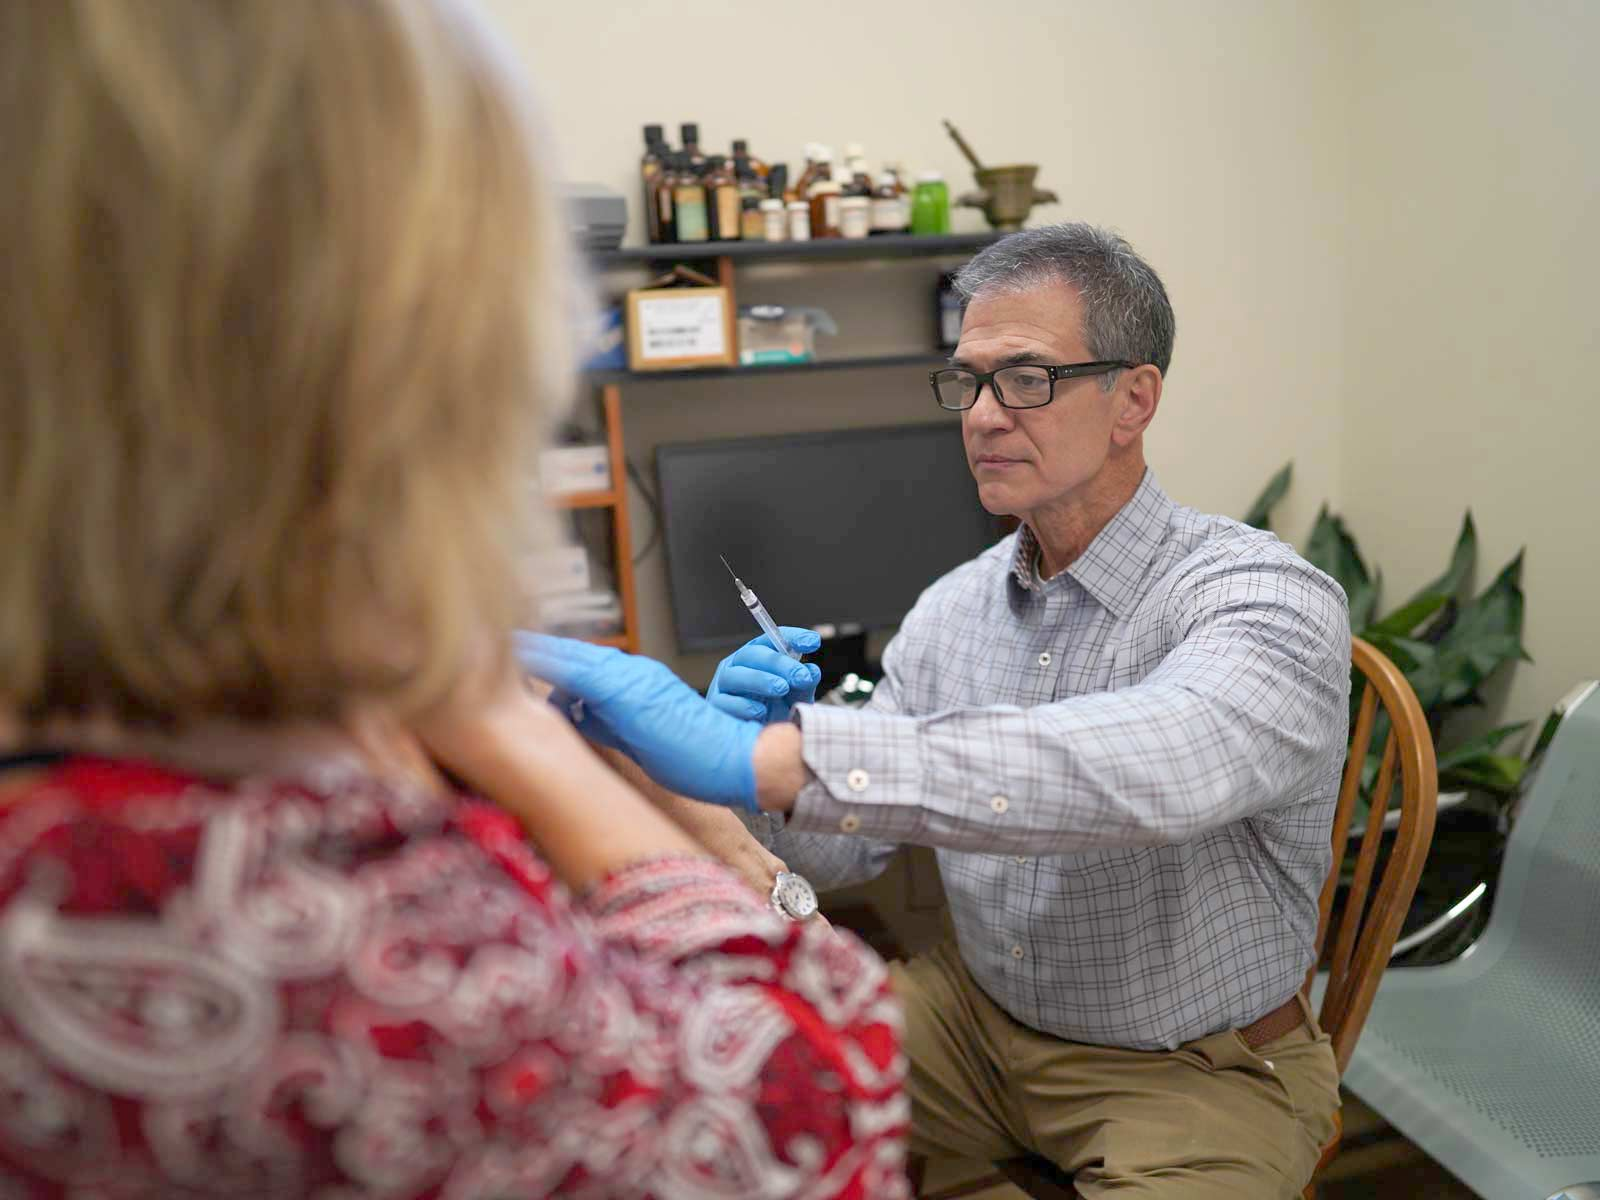 RPh Gerald Giardina preparing to give a immunization shot to a customer